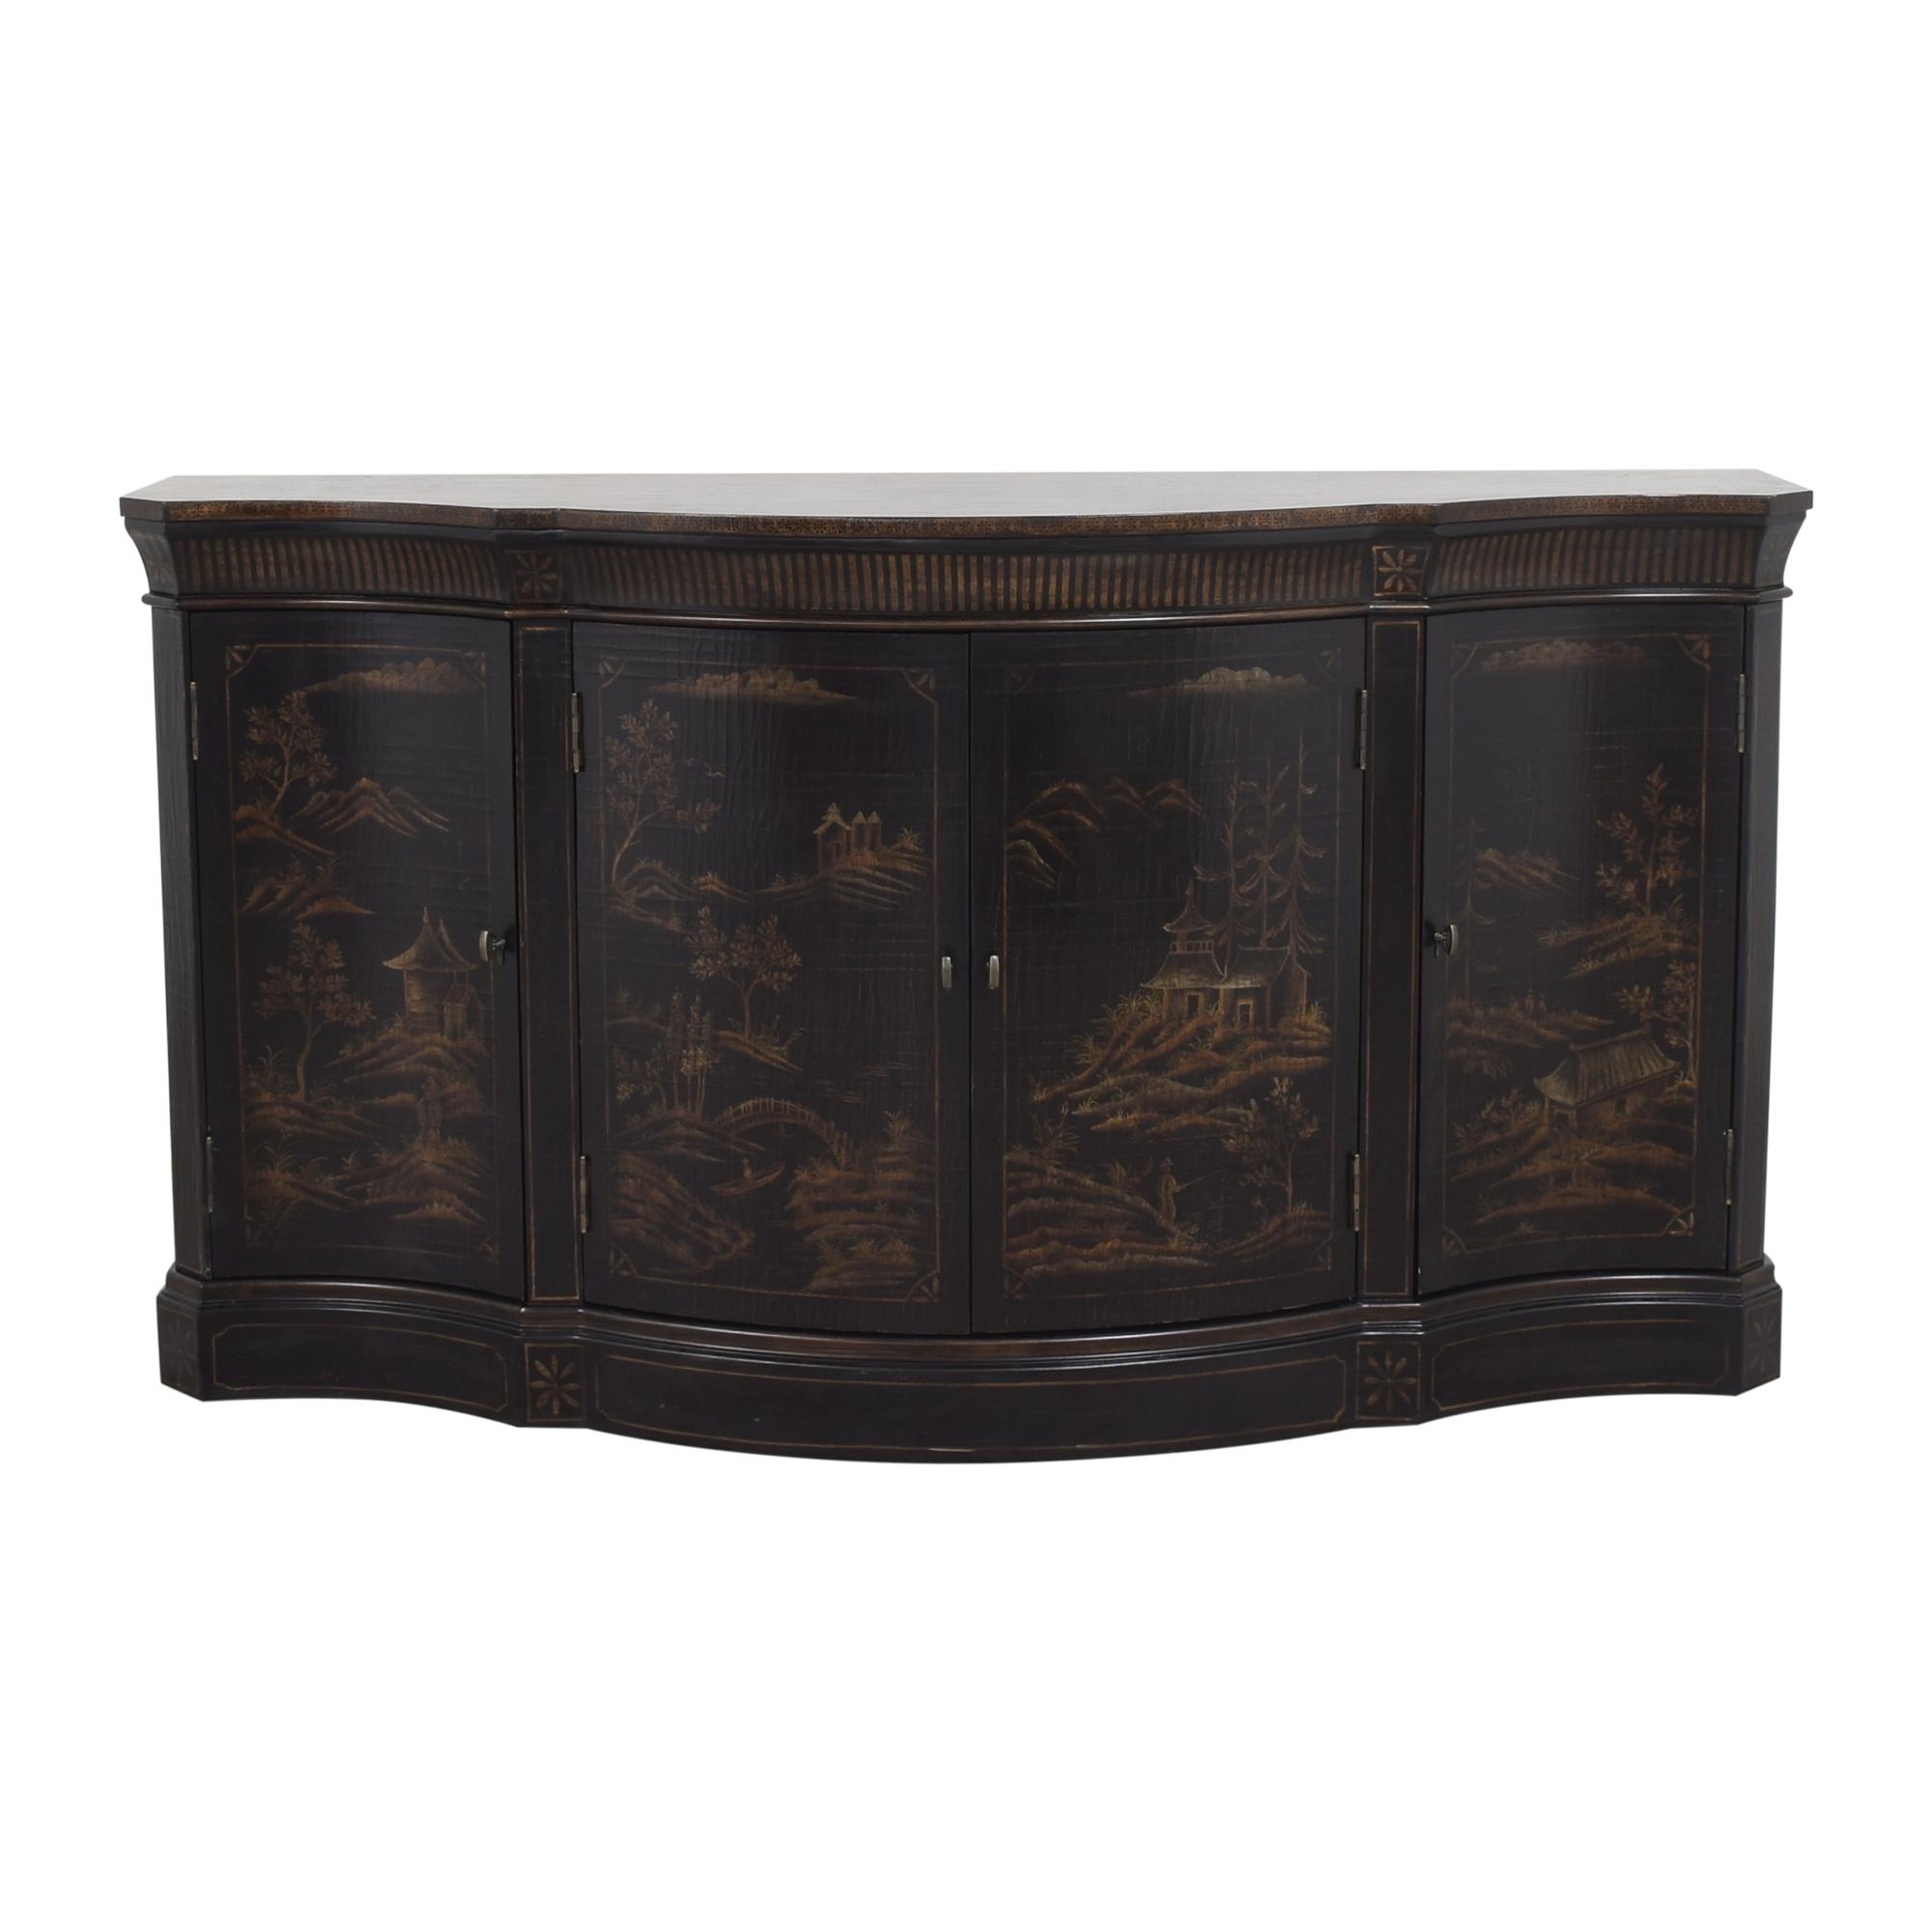 shop Ethan Allen Vivianne Serpentine Console Ethan Allen Cabinets & Sideboards